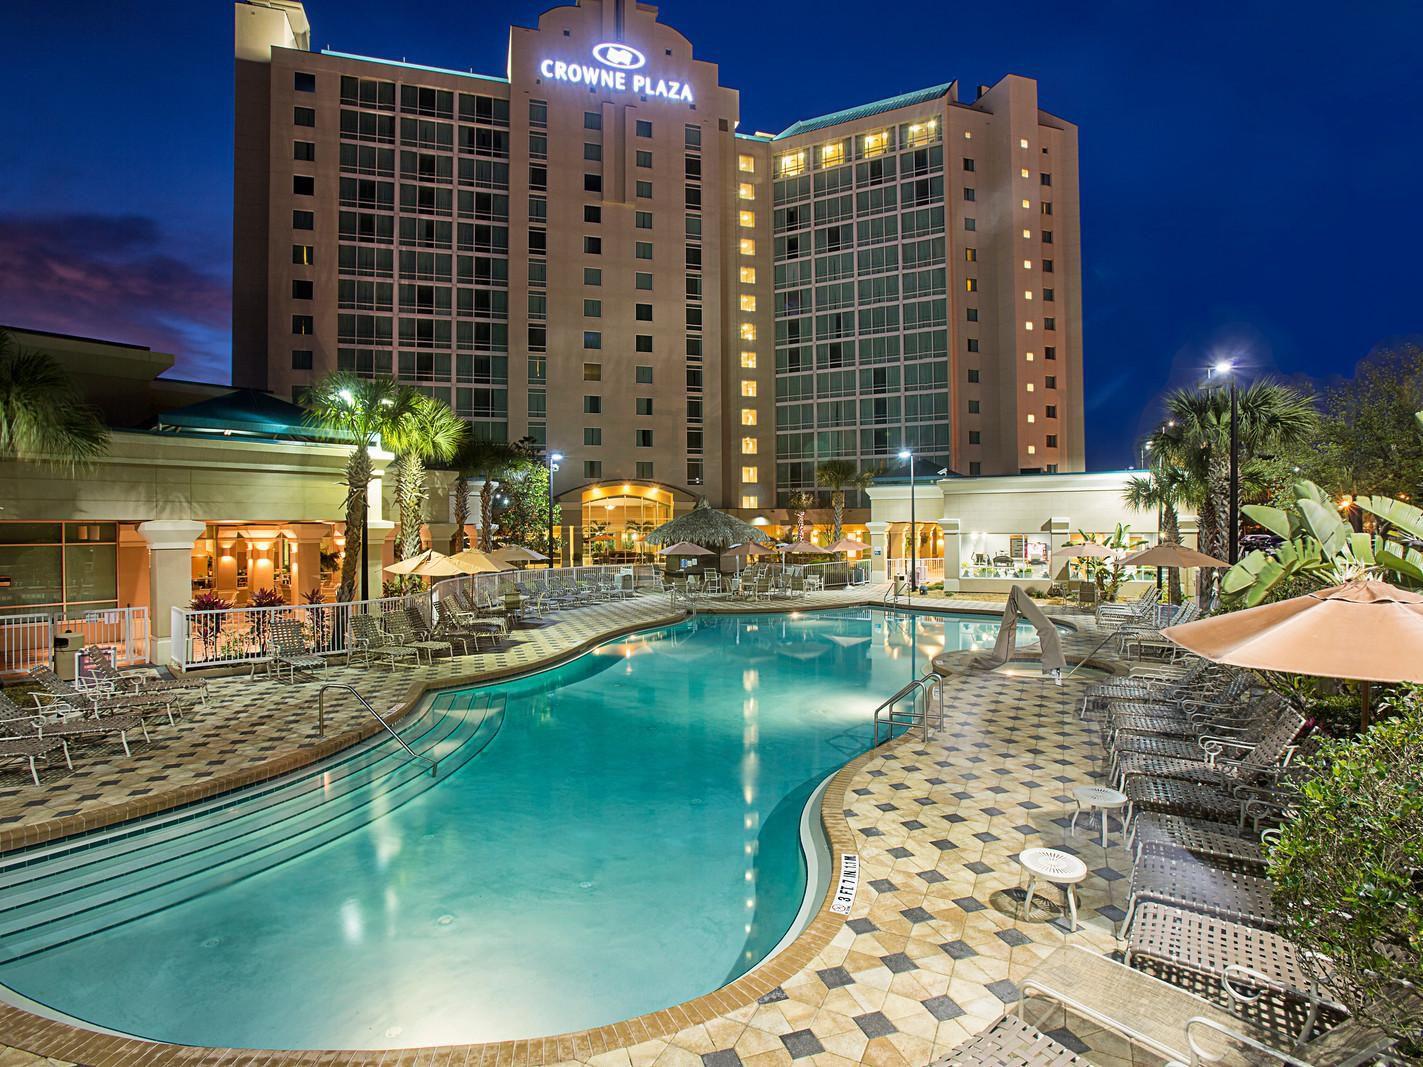 universal studios orlando deals and hotels